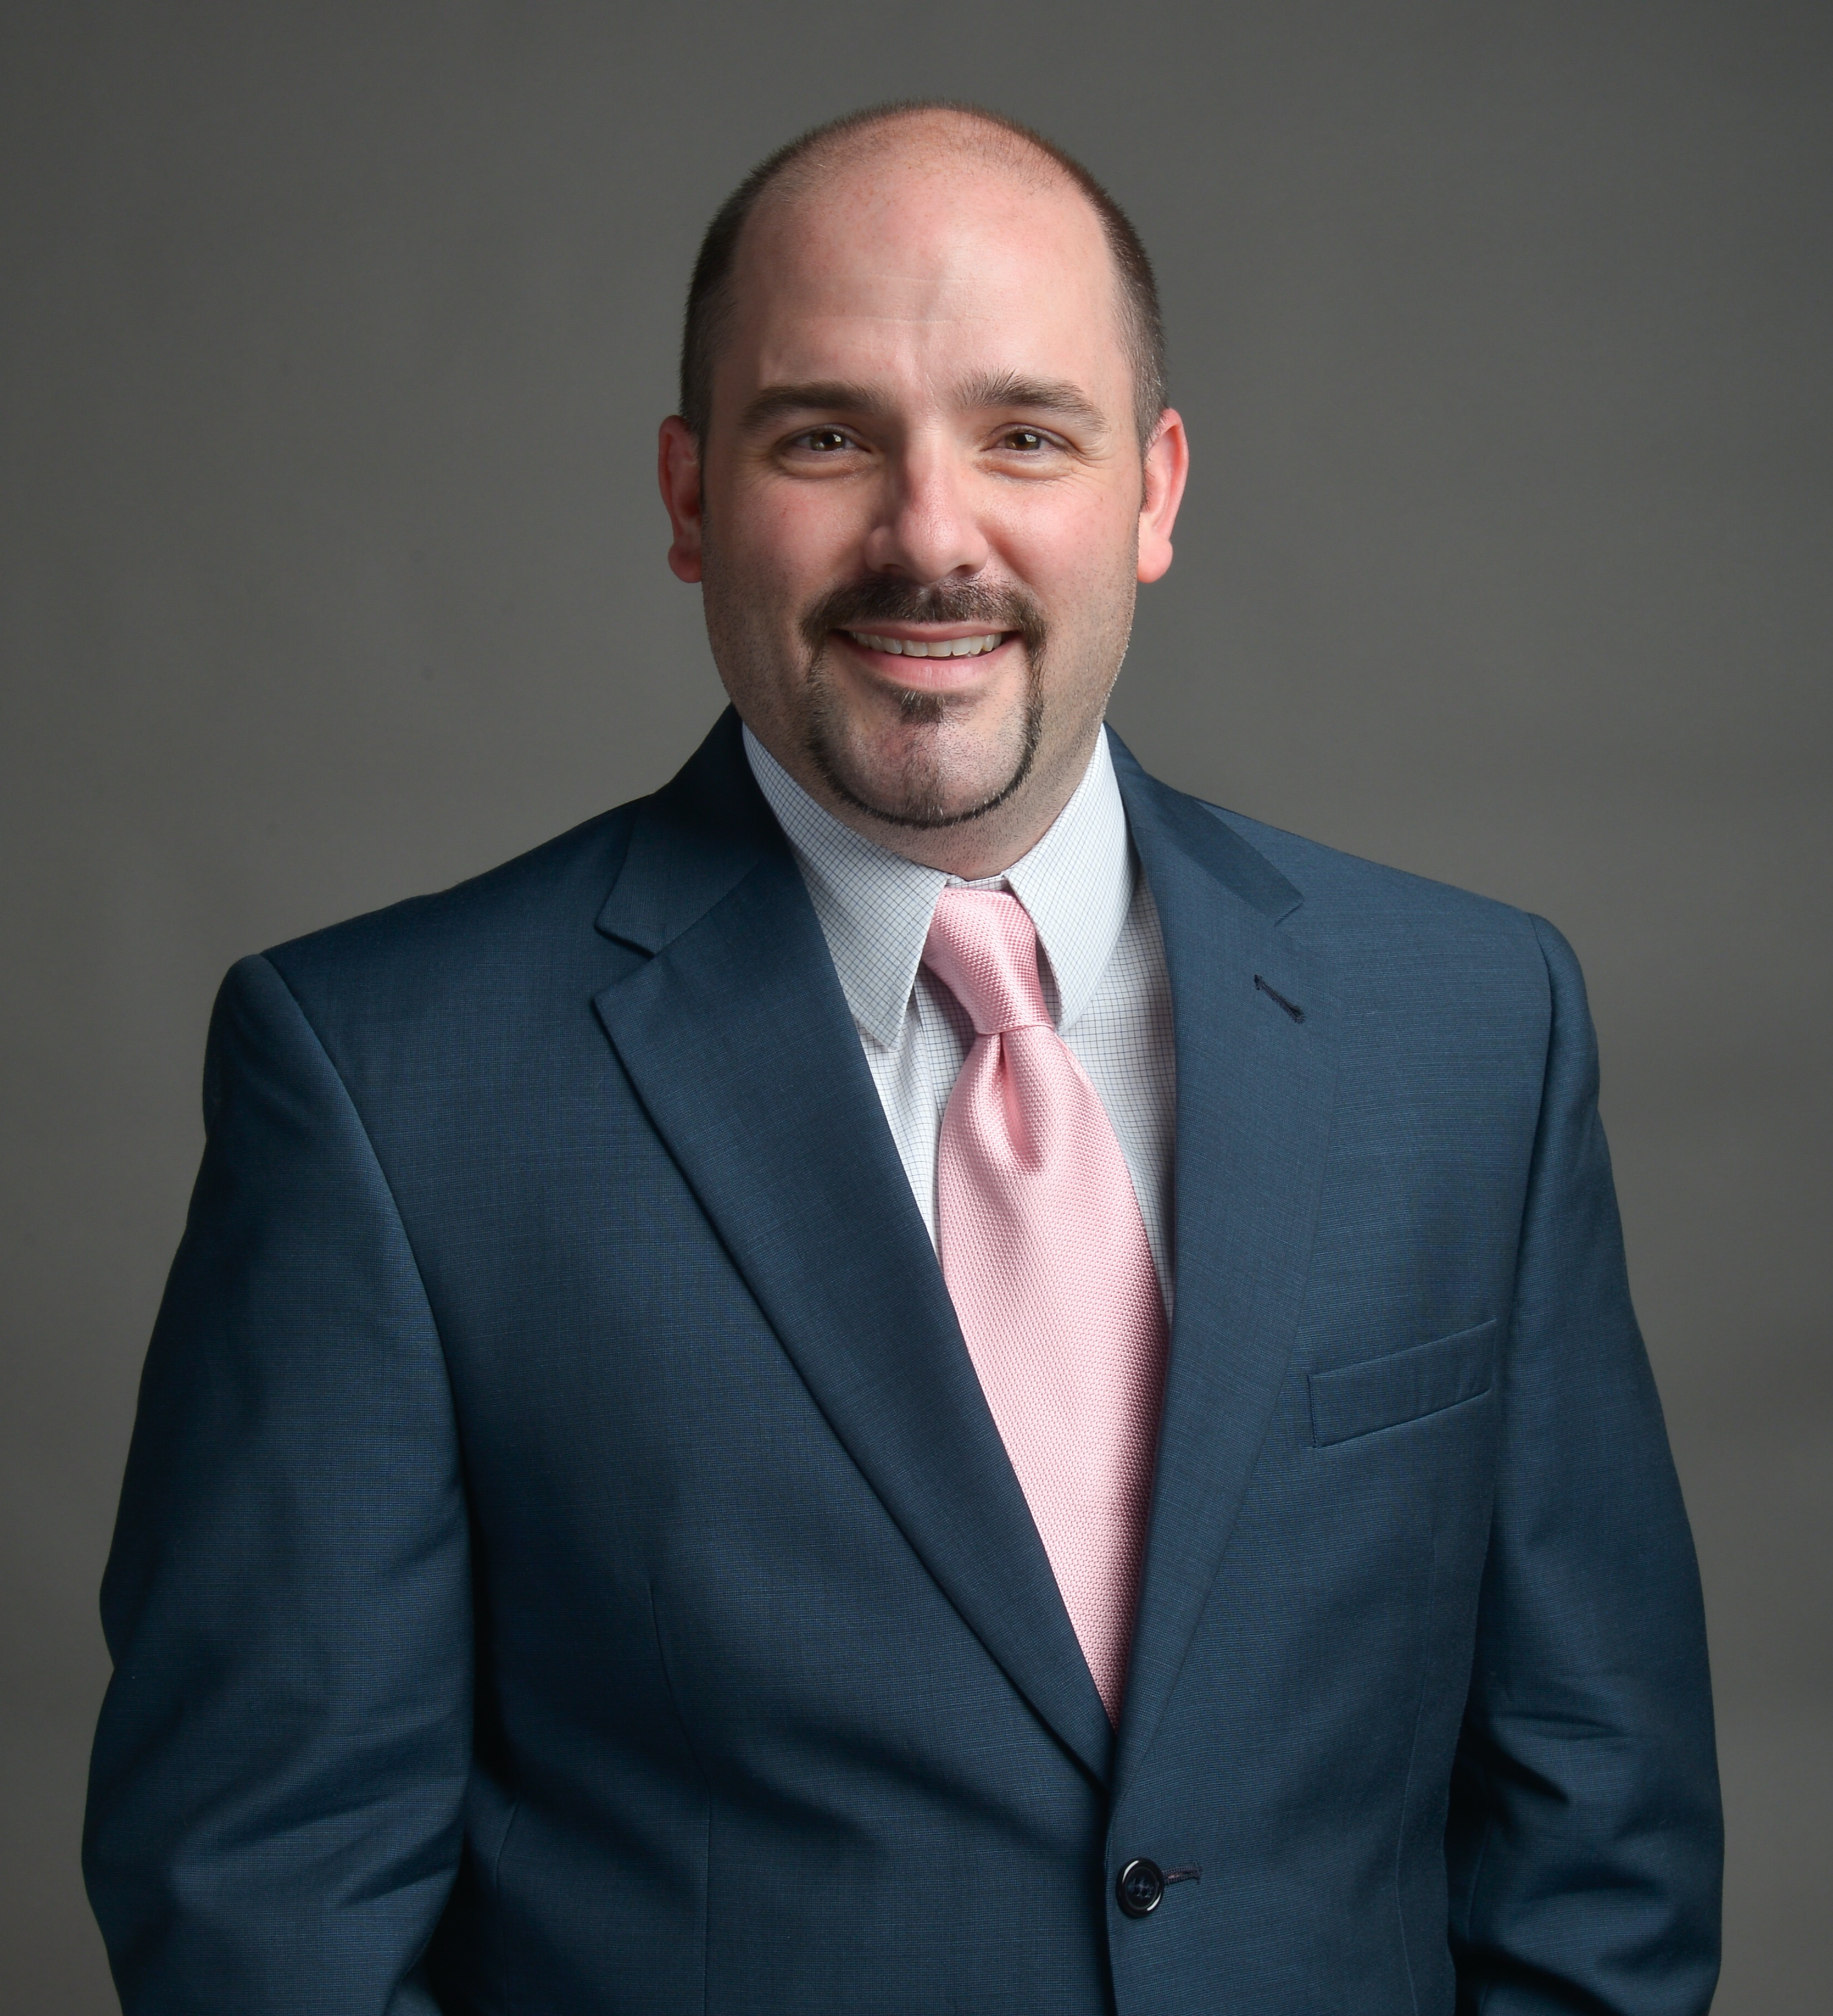 Dustin Paschal's Profile Image